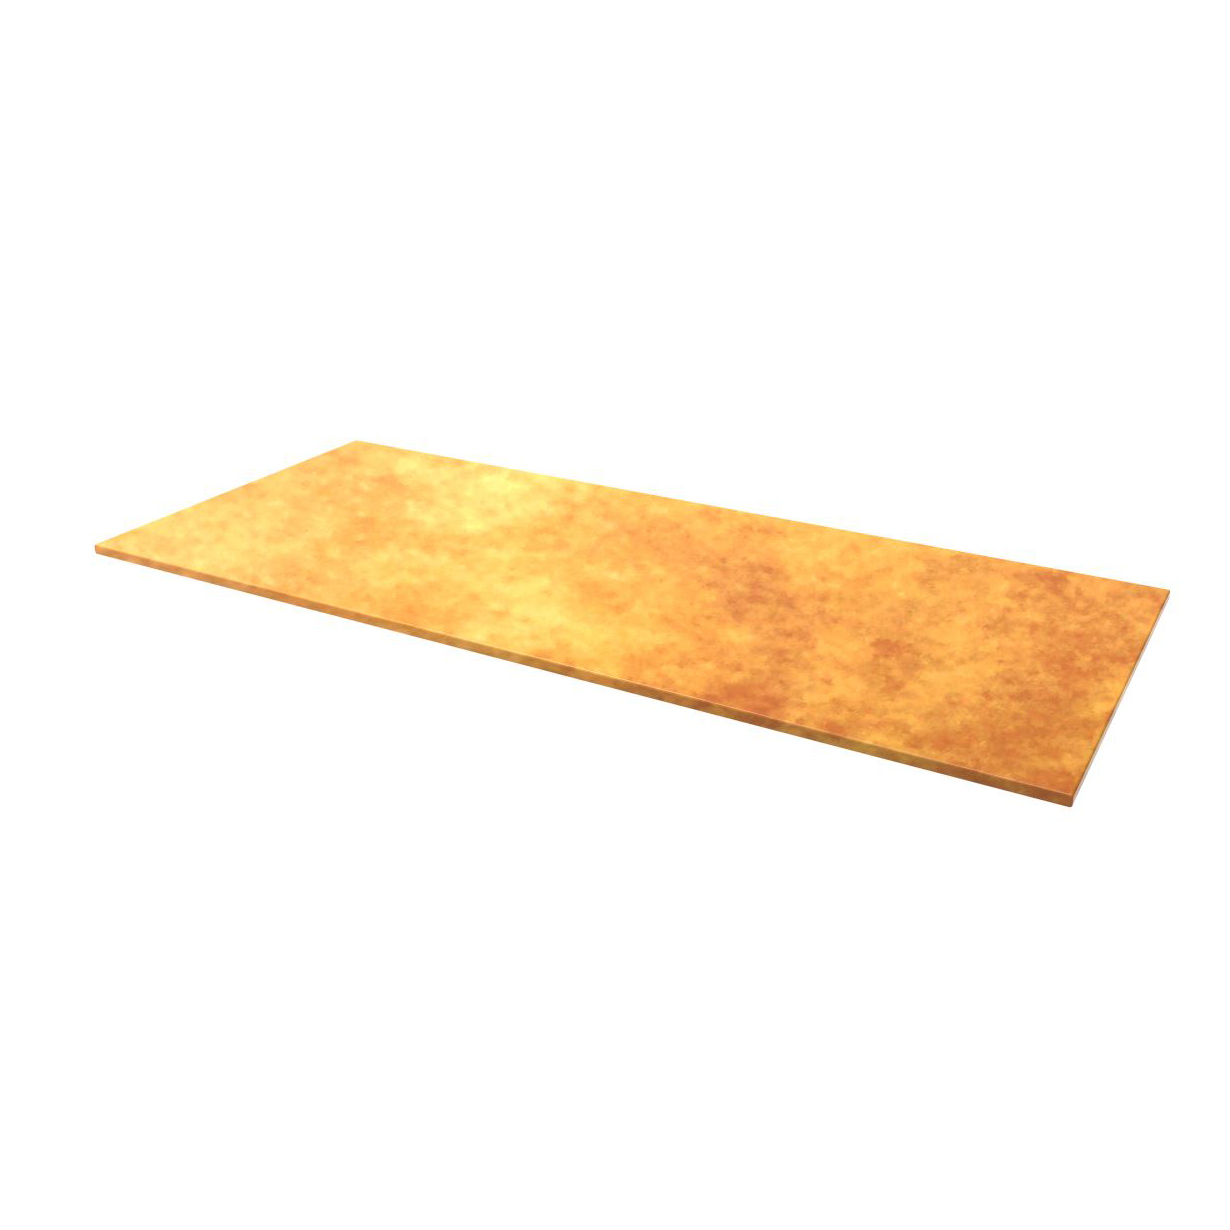 Hoshizaki HS-5272 cutting boards